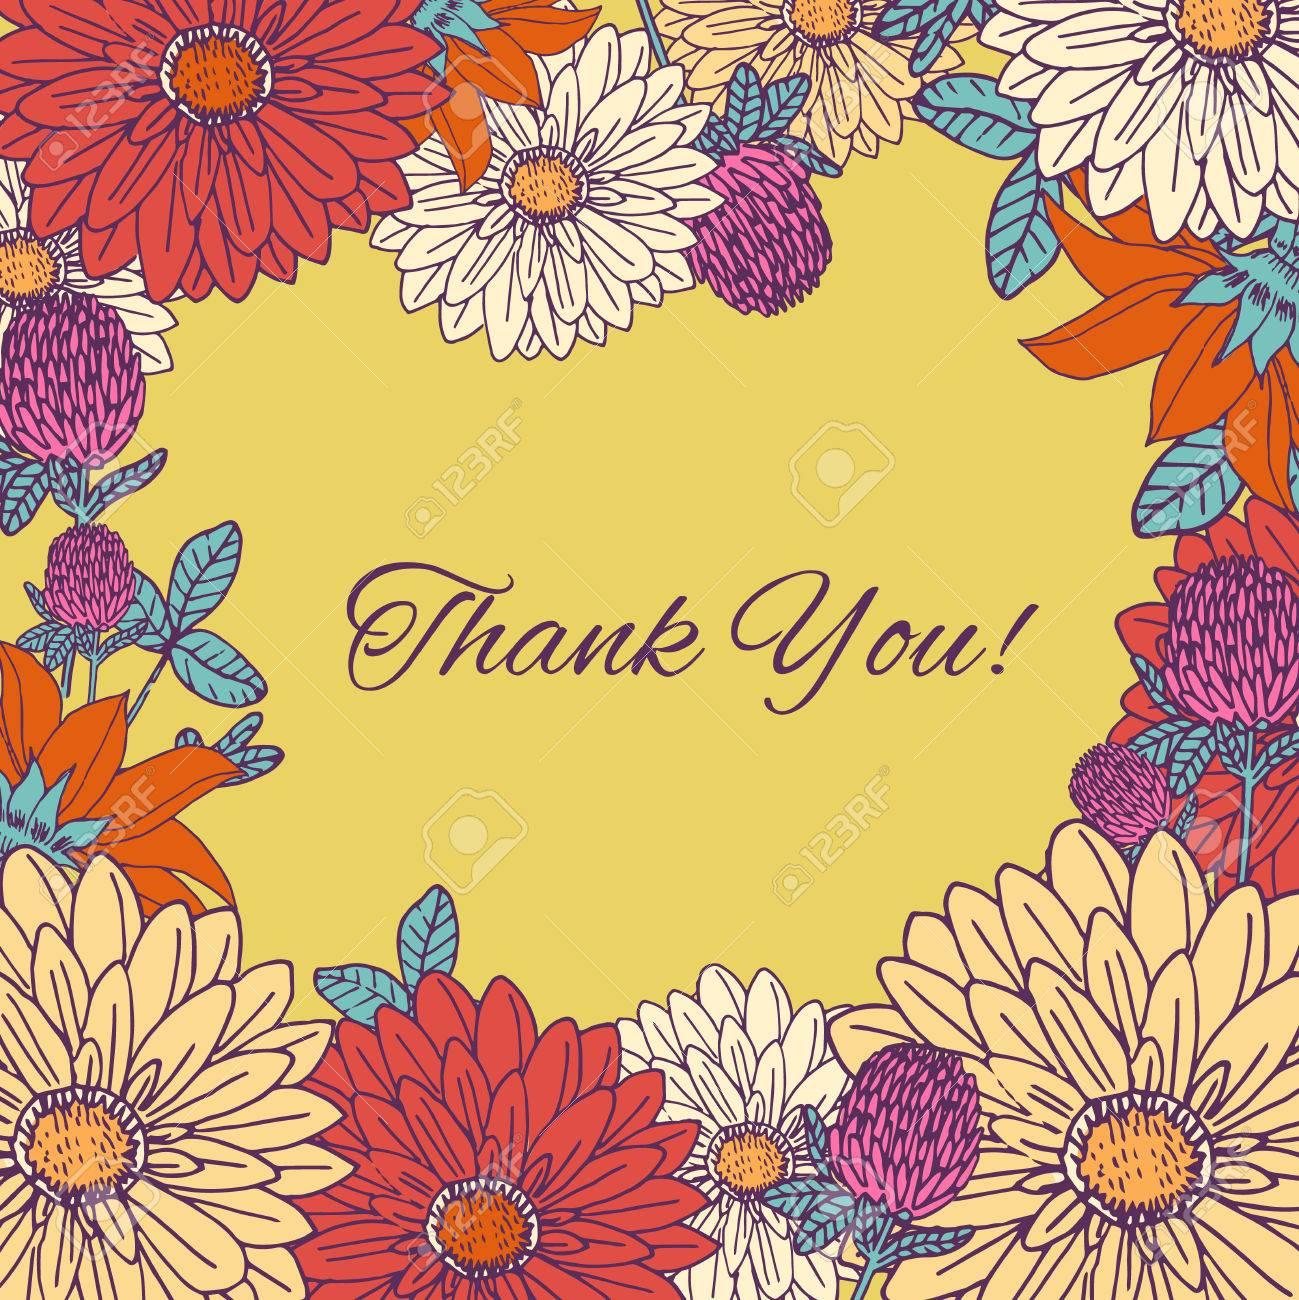 Vintage flowers hand drawn thank you greetings postcard background vintage flowers hand drawn thank you greetings postcard background vector illustration foto de archivo 37809515 kristyandbryce Choice Image